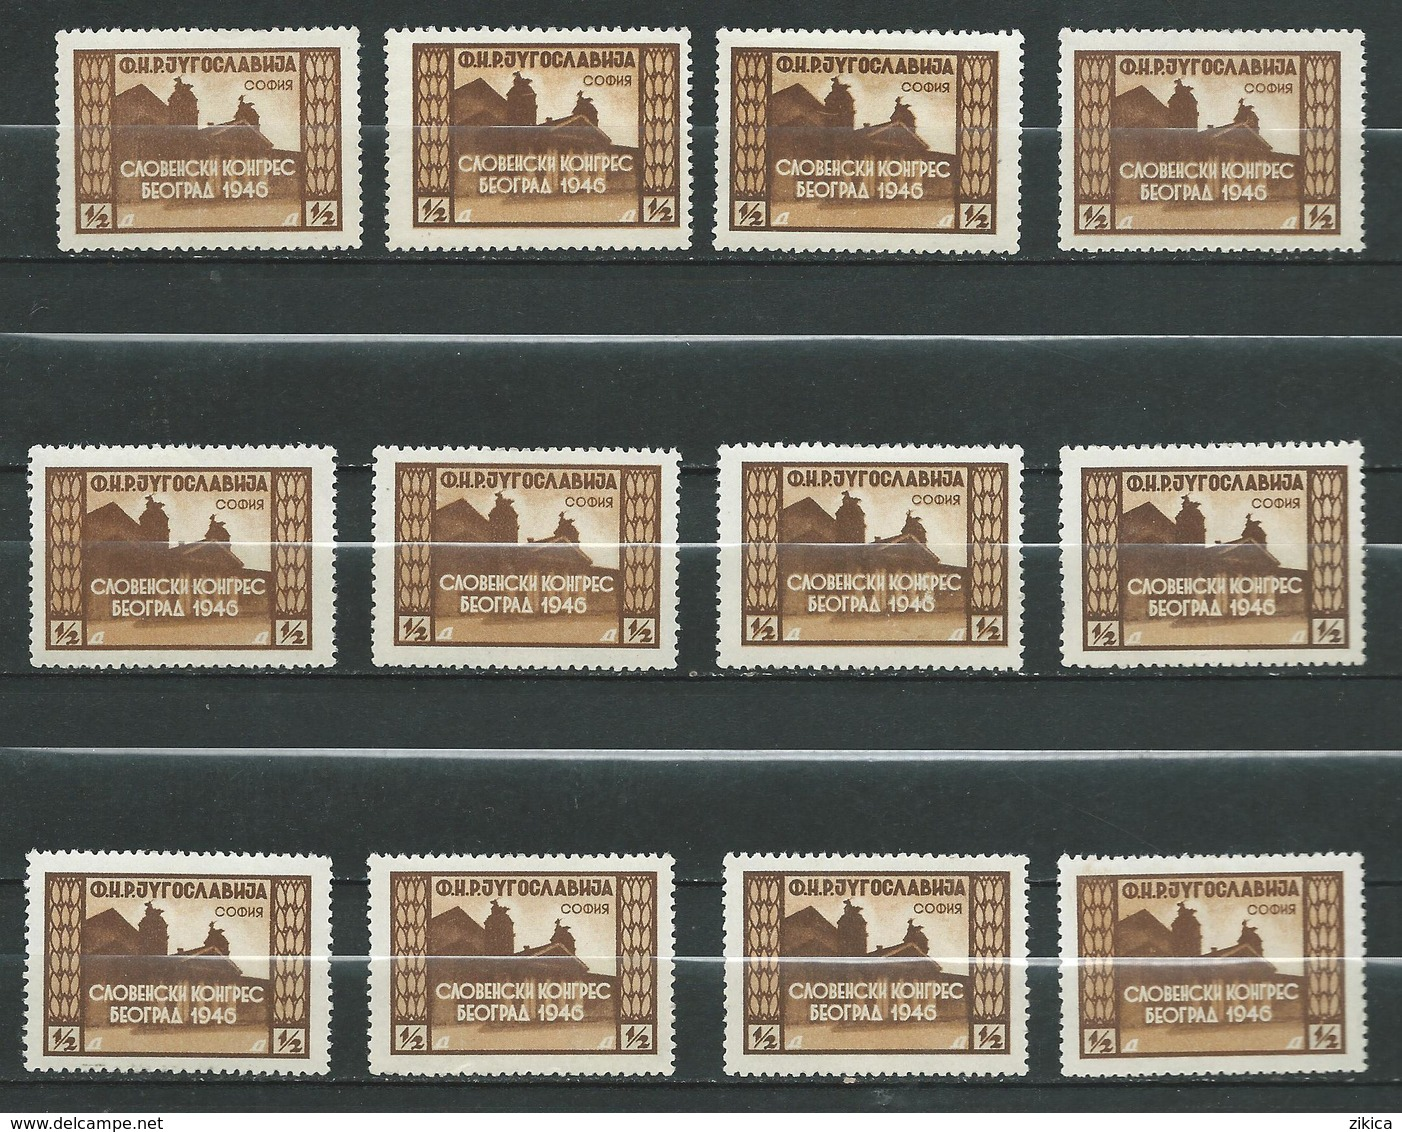 Yugoslavia 1948 Slav Congress - Lot 12 Stamps - National Theater In Sofia,Bulgaria - MNH** - 1945-1992 Socialistische Federale Republiek Joegoslavië